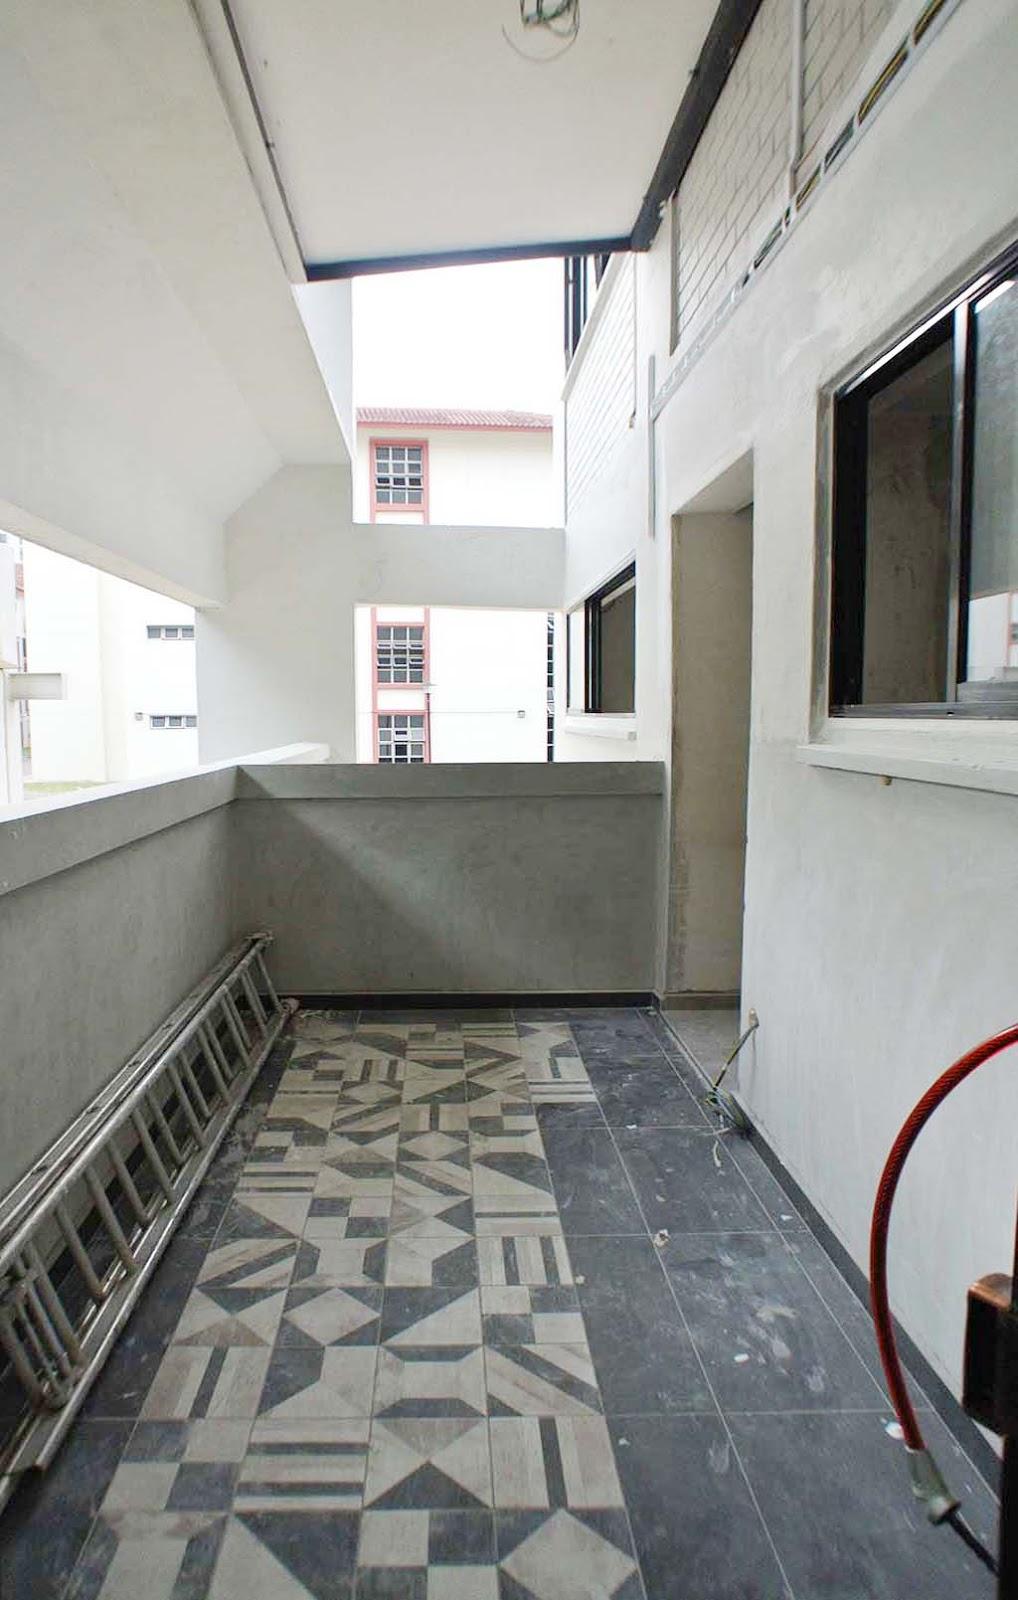 Butterpaperstudio reno 721b maisonette recessed area for Recessed area